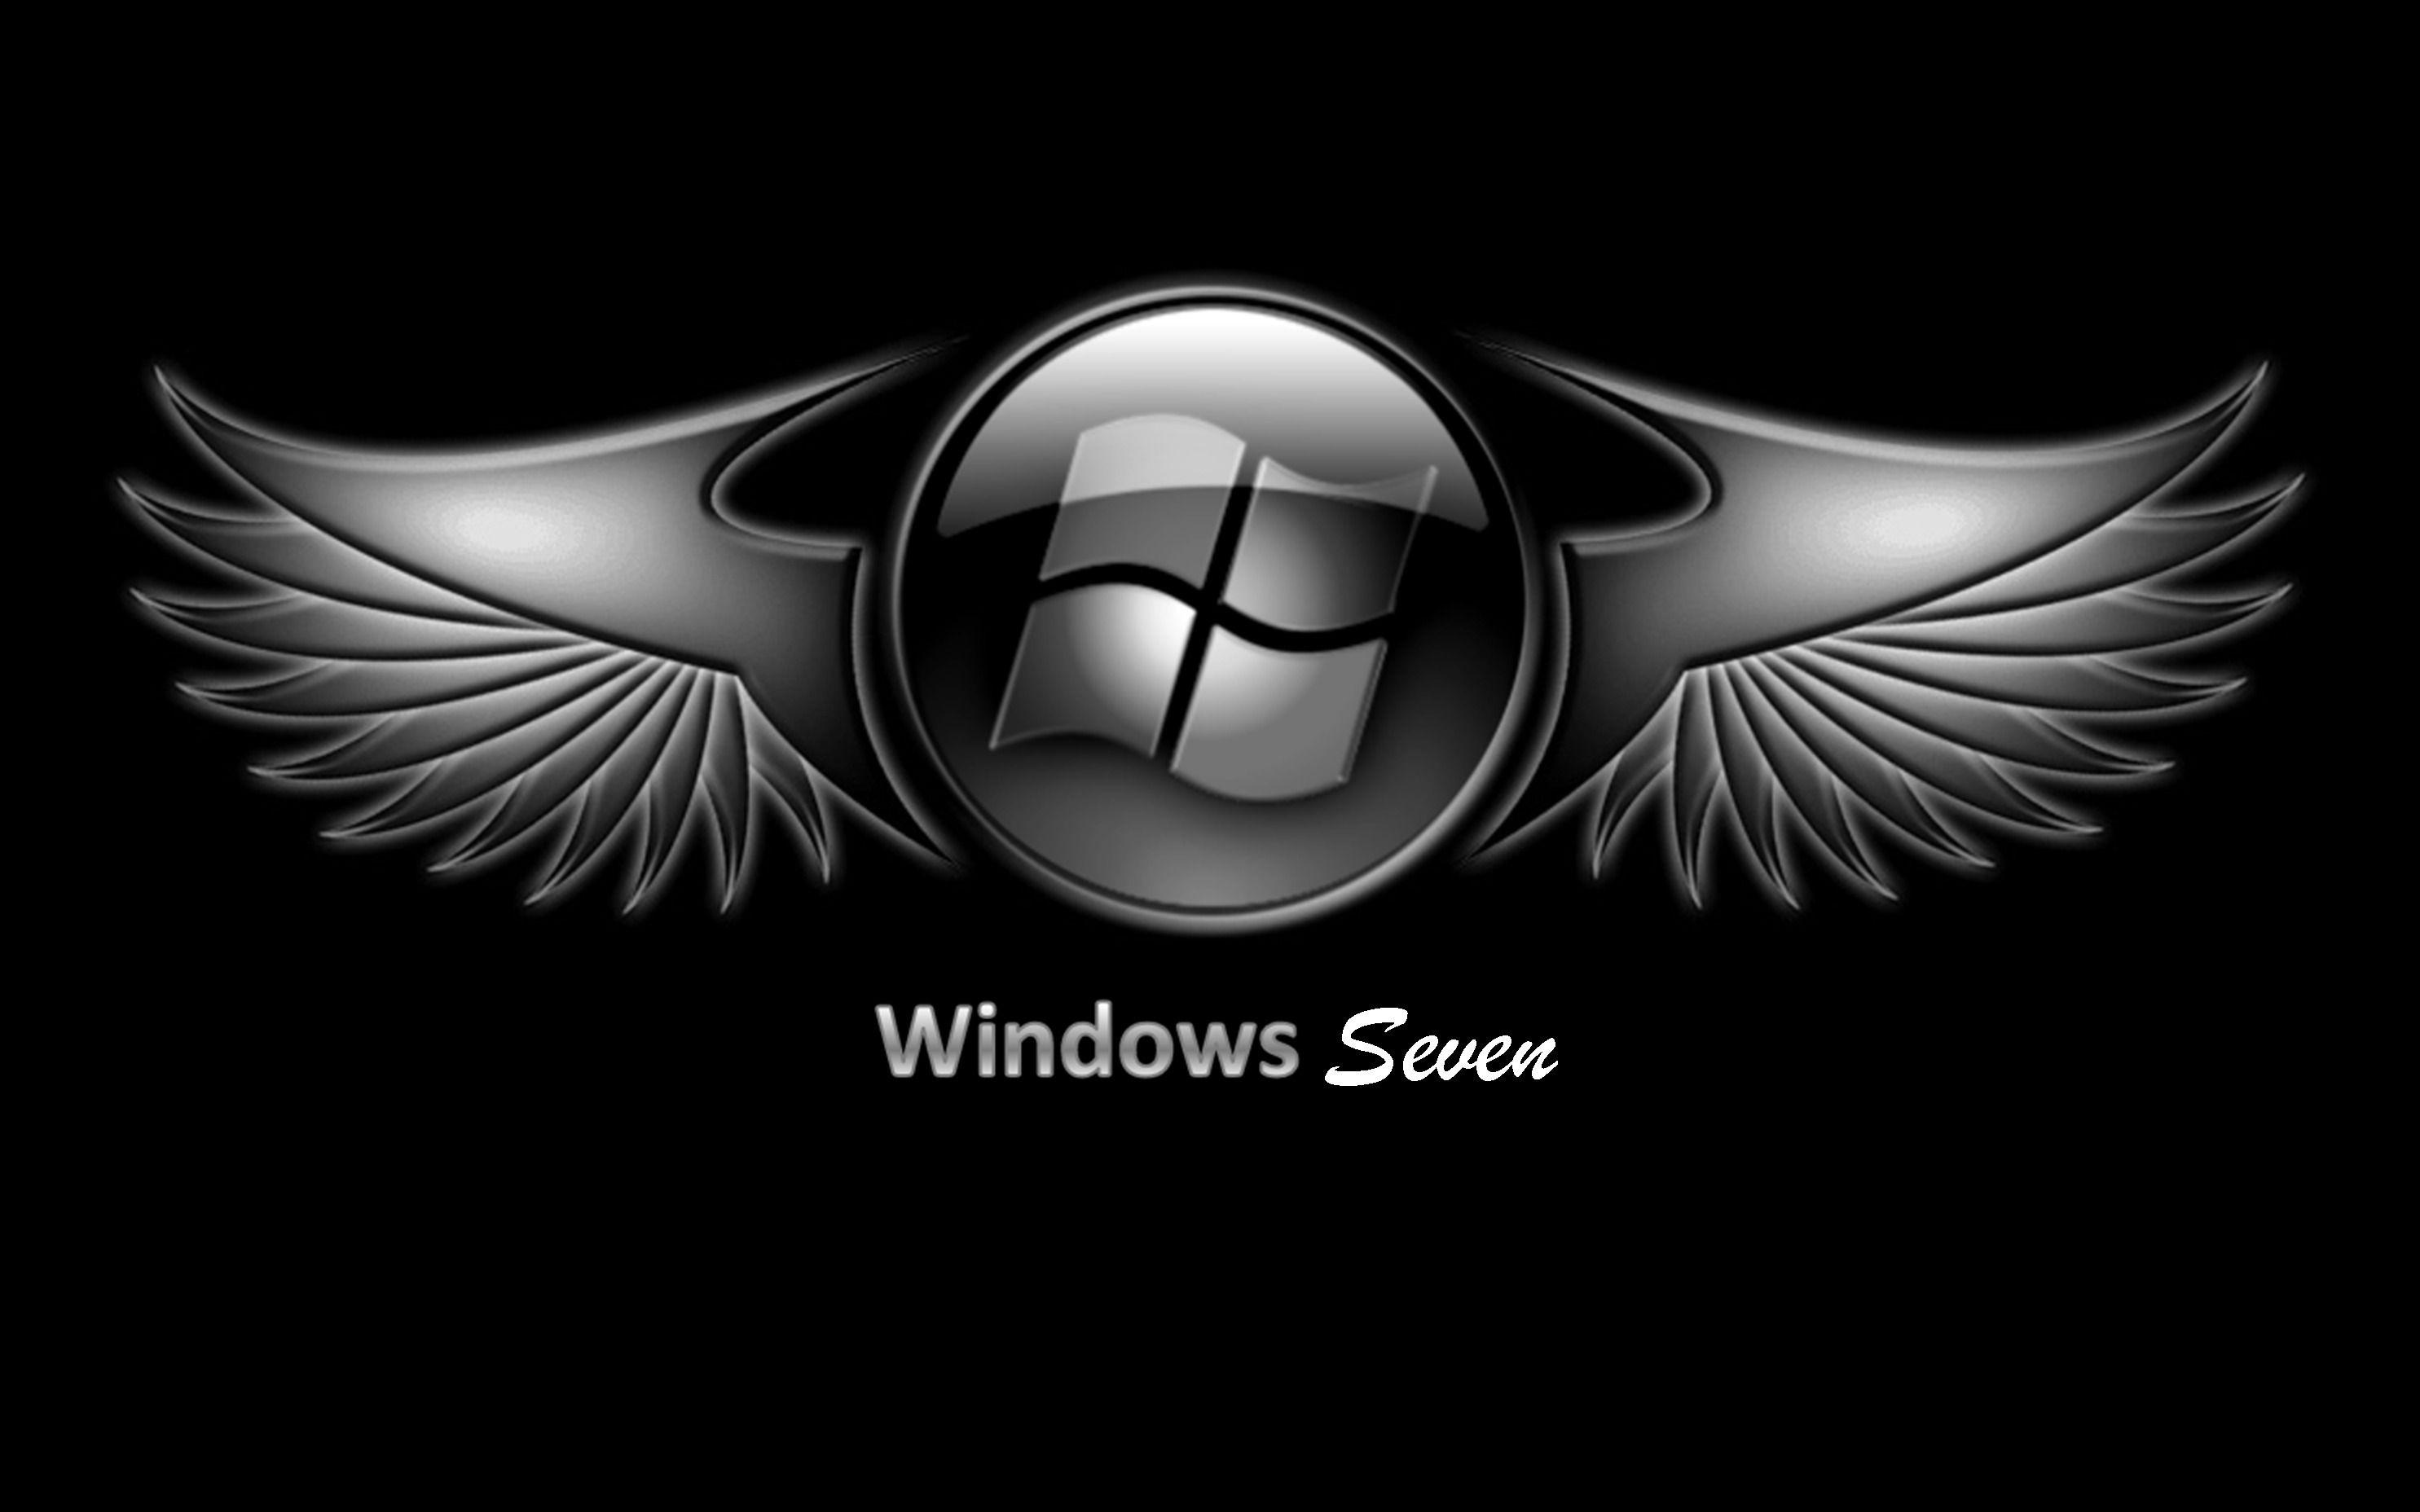 microsoft windows 7 black logo wallpaper 16 10 widescreen wallpapers